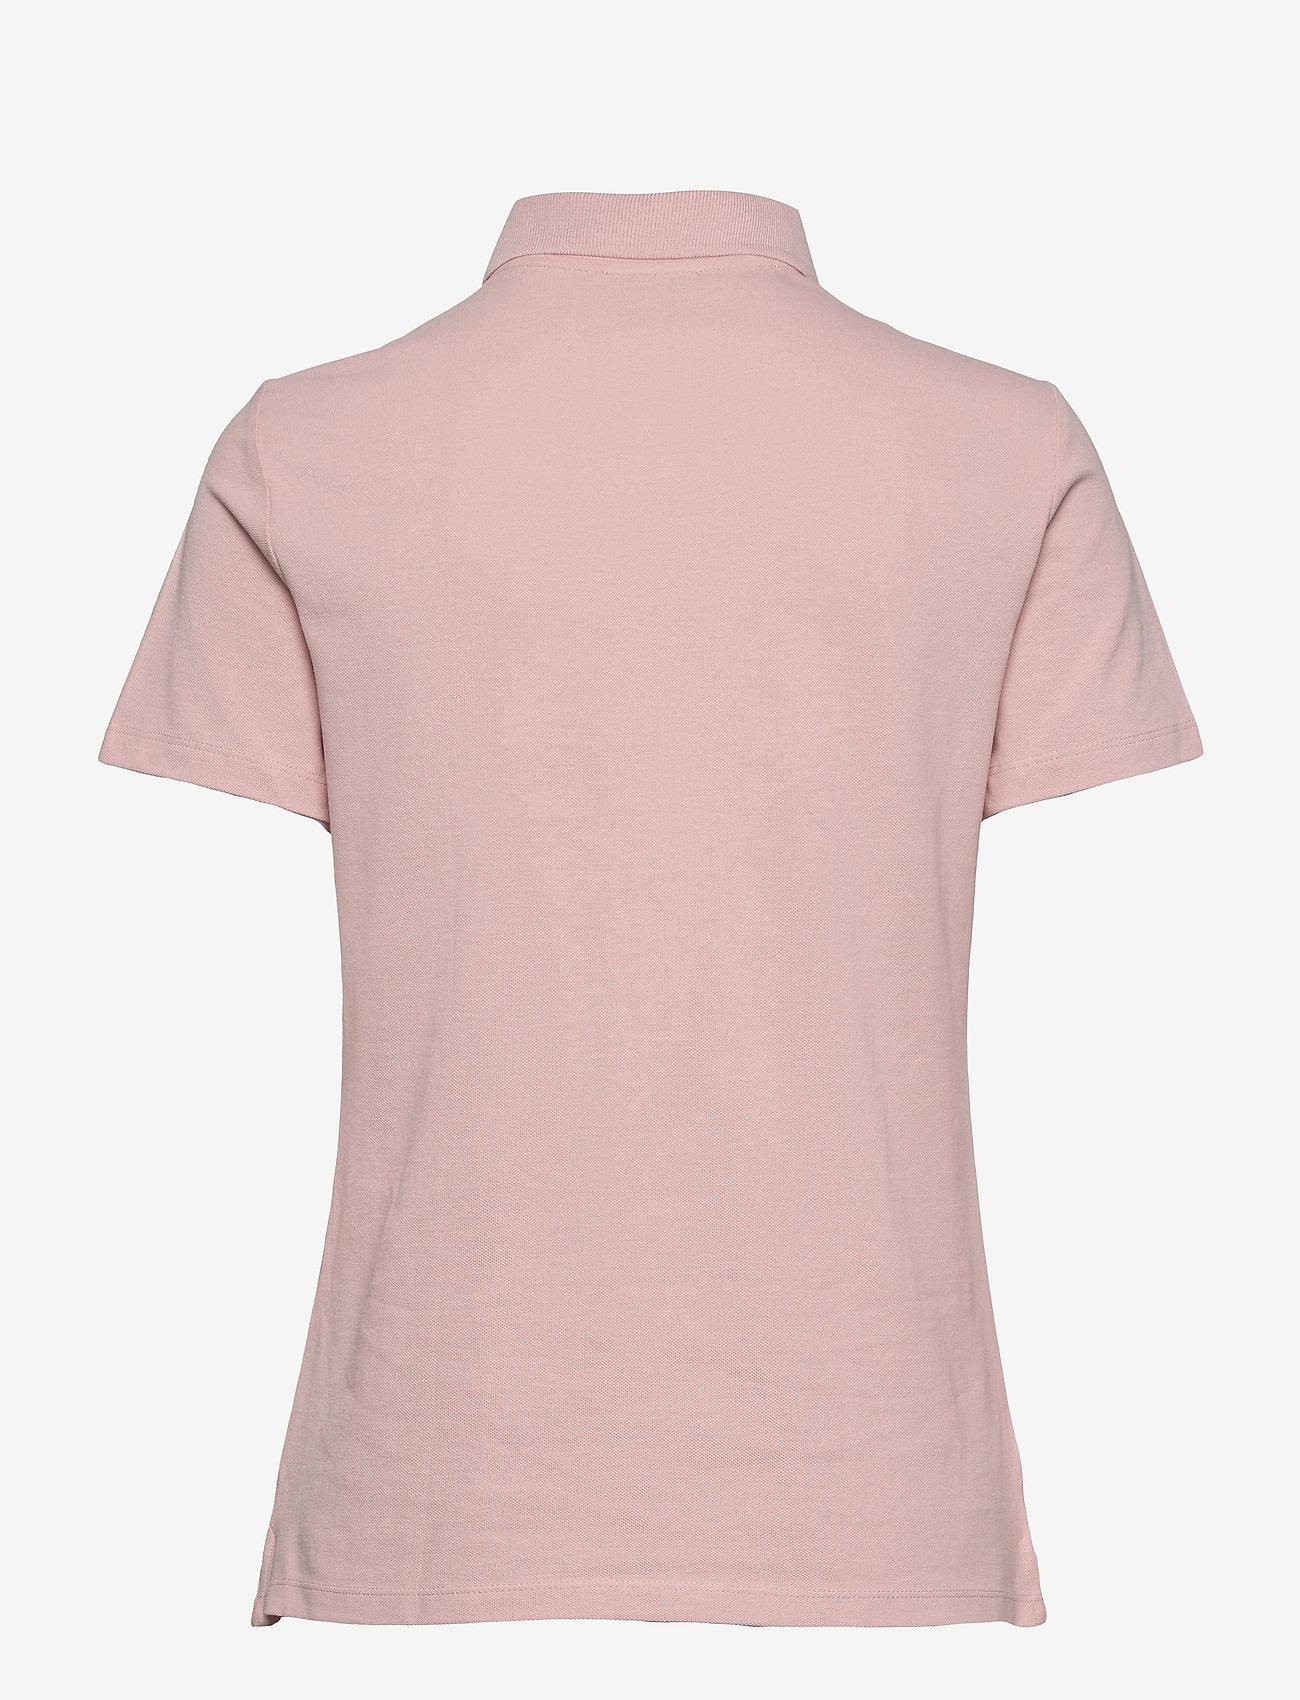 Esprit Casual - T-Shirts - polohemden - nude - 1